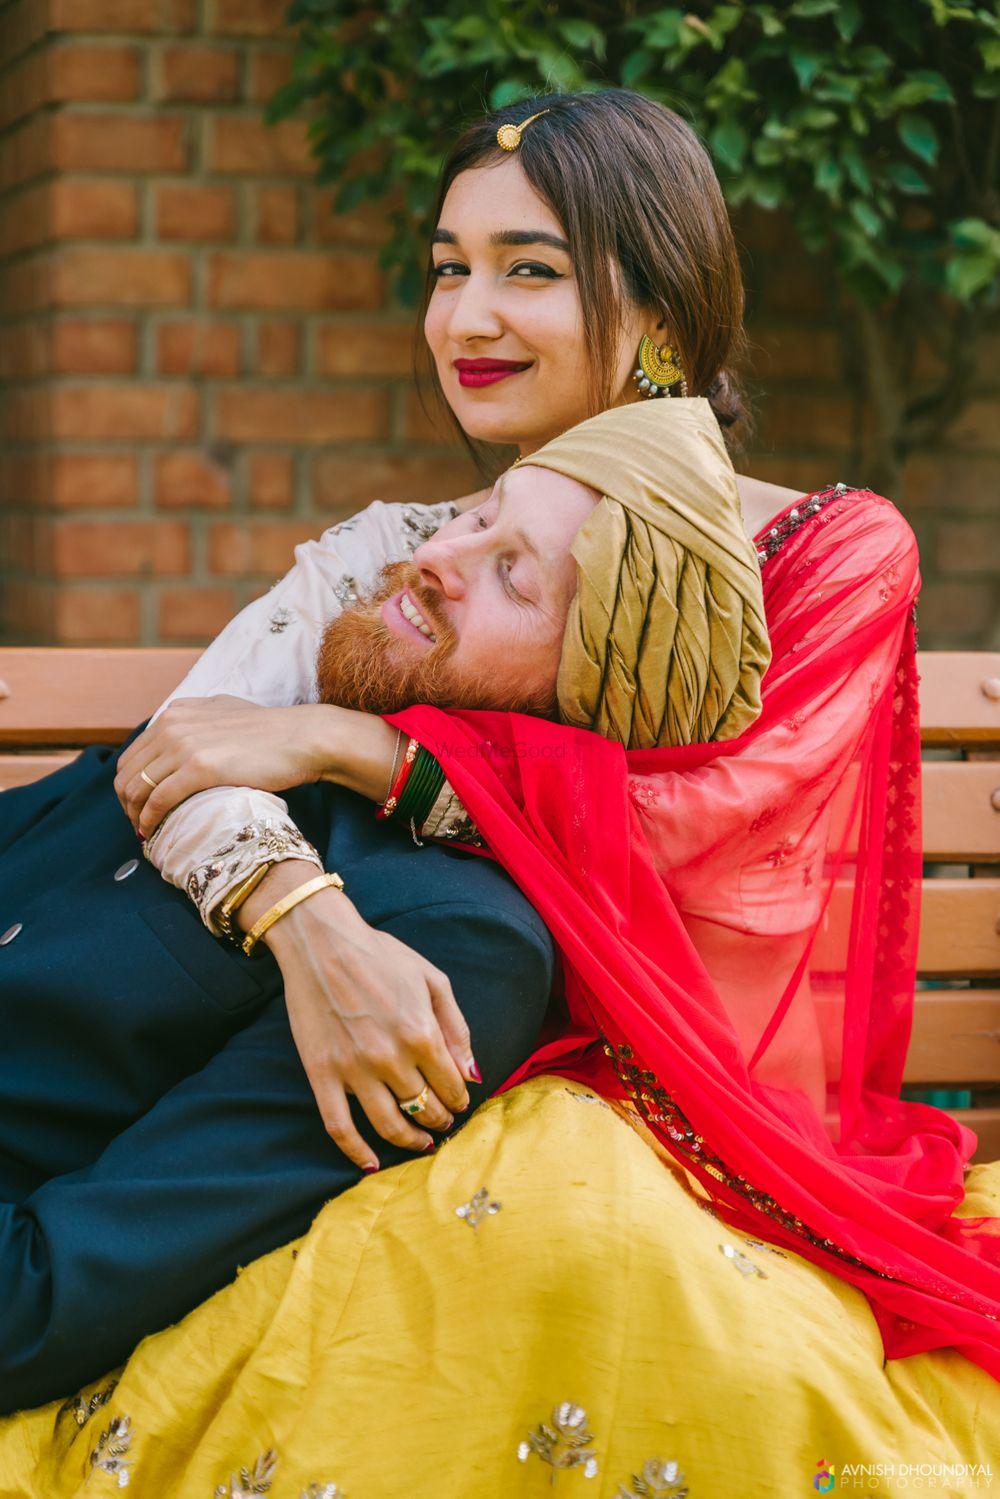 Photo From    Karnika + Reima    - By Avnish Dhoundiyal Photography